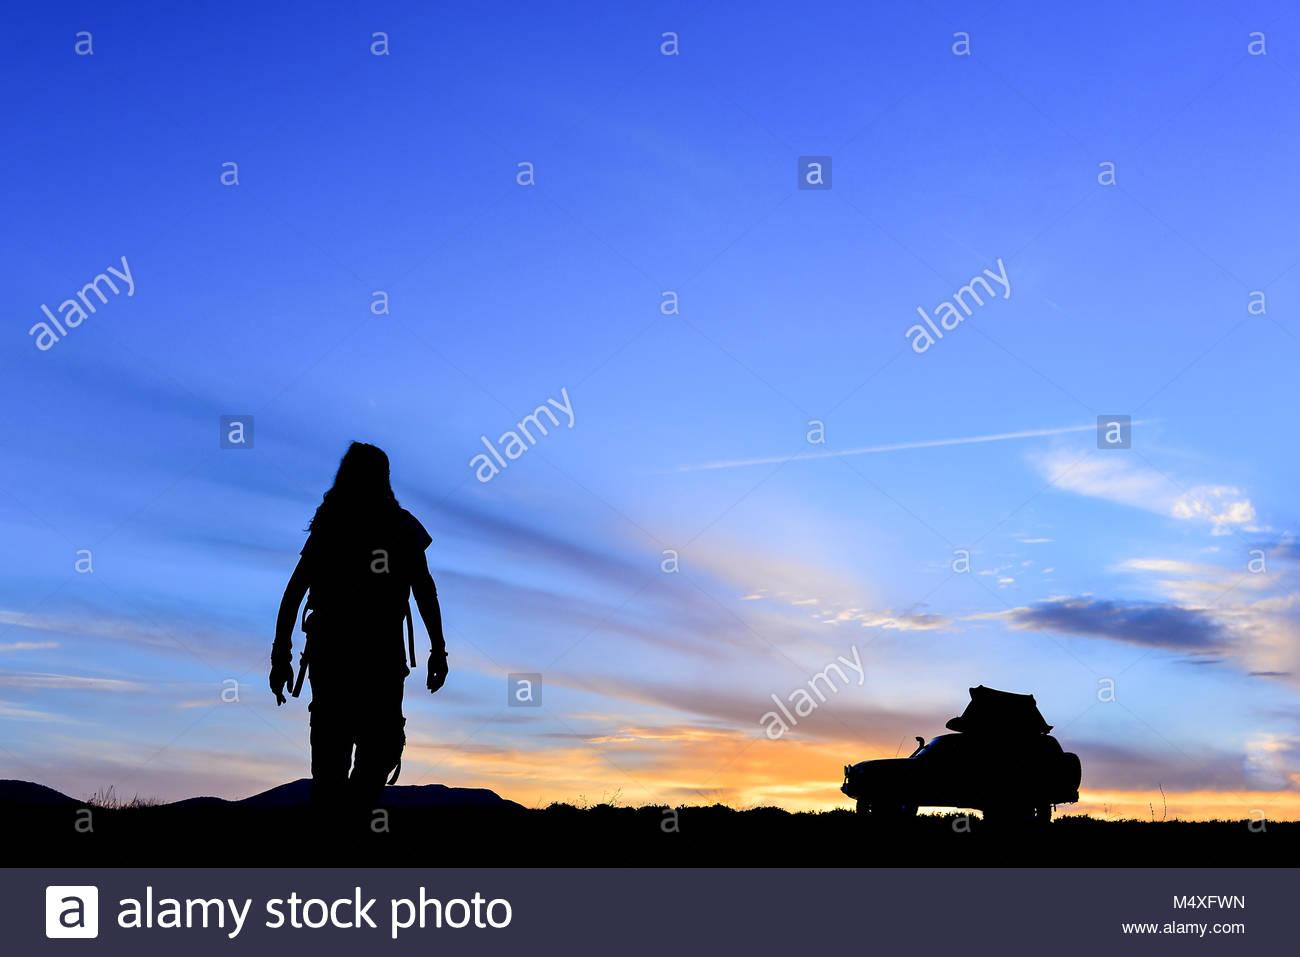 Man in pursuit of adventure - Stock Image